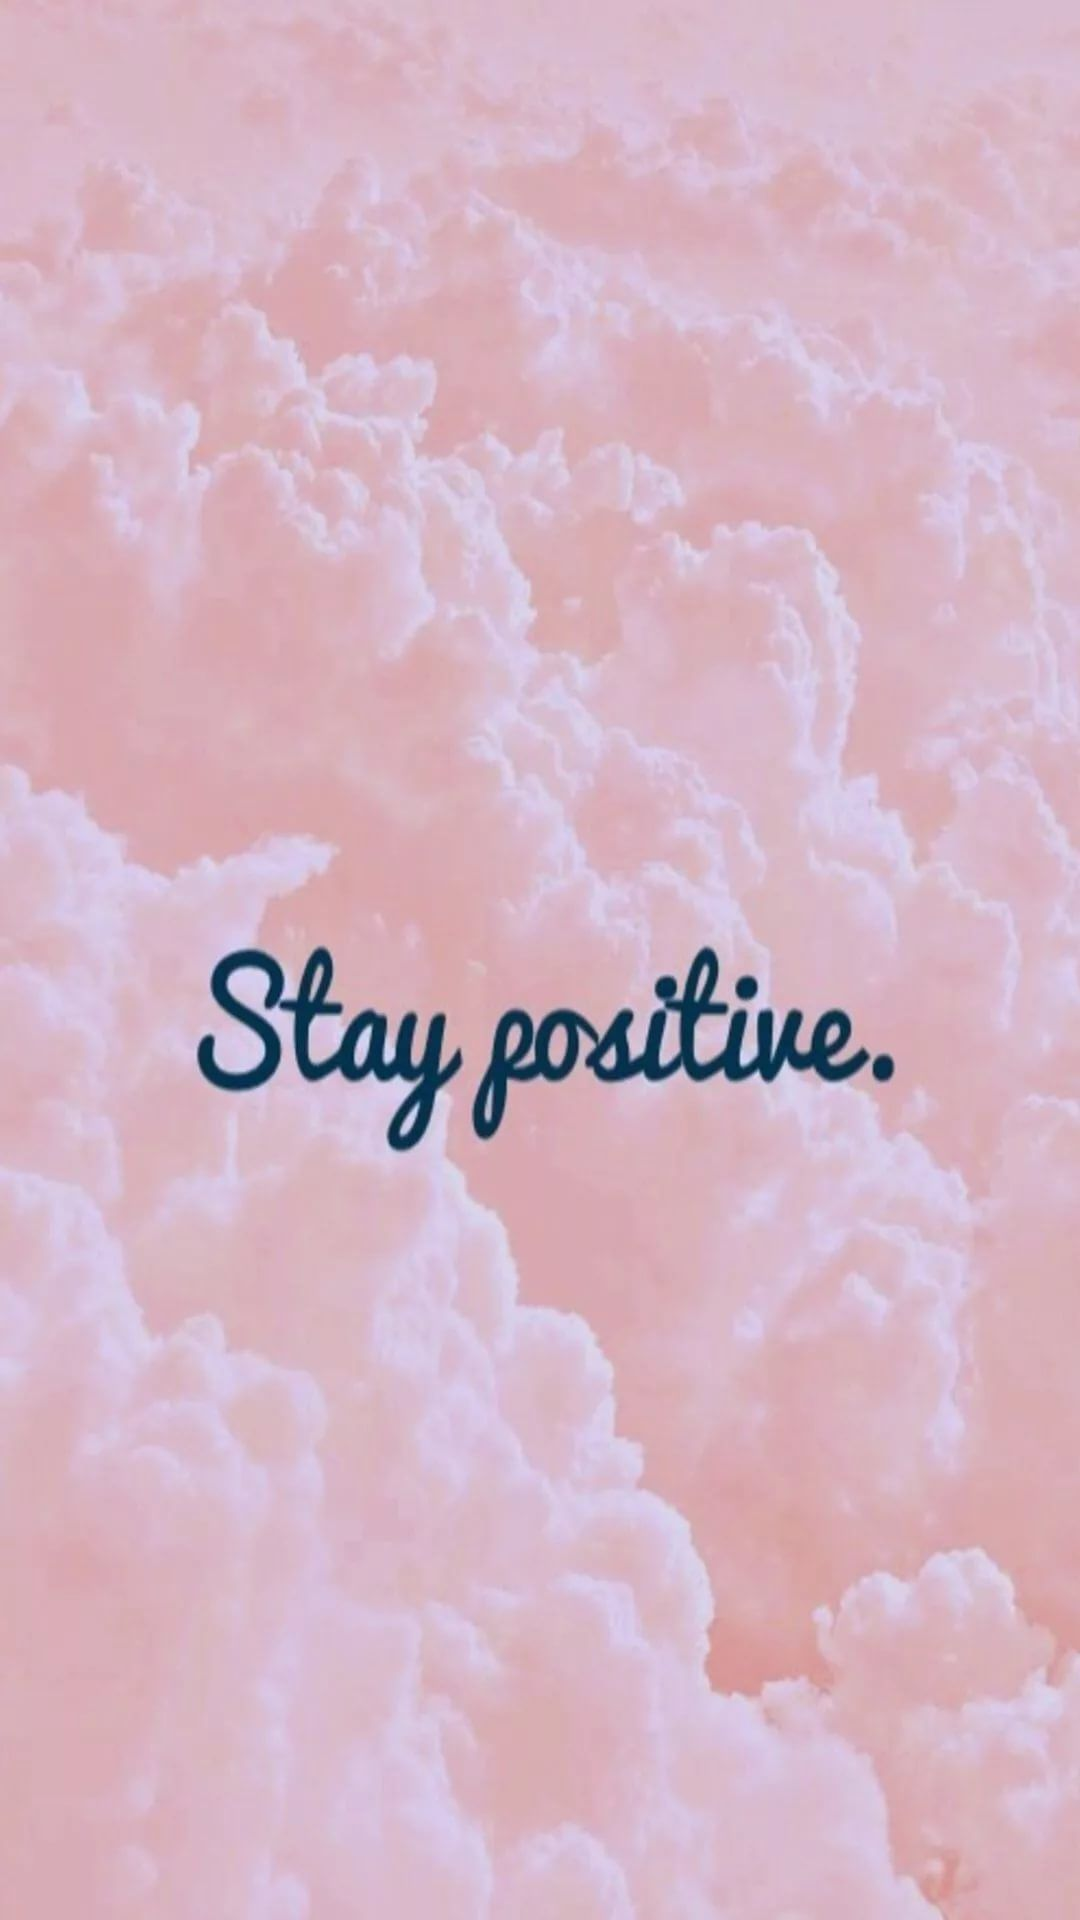 Positive iPhone lock screen wallpaper